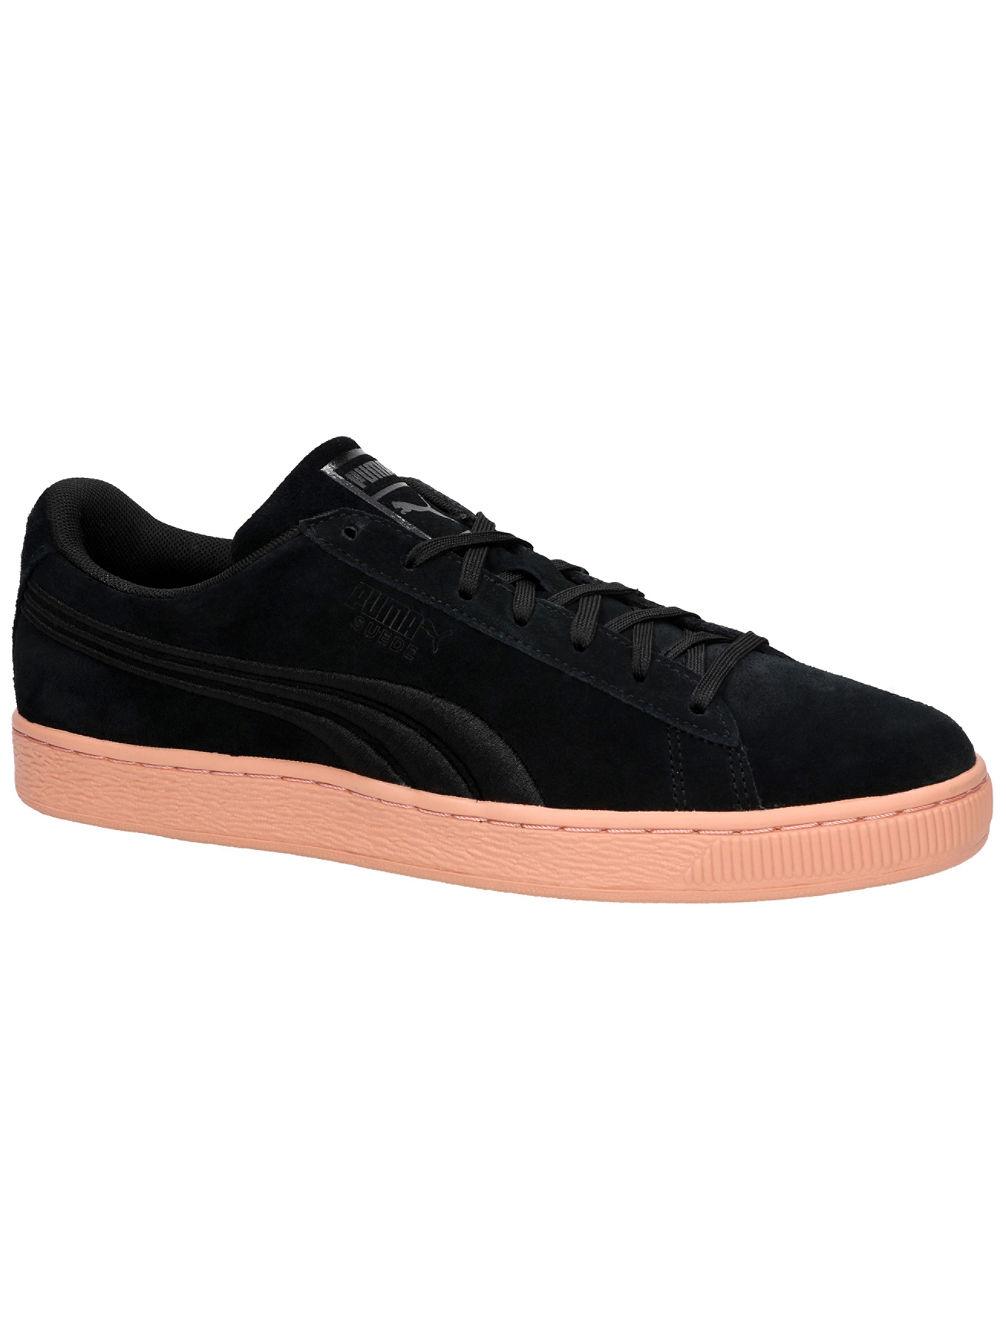 53b5eeaa31ec Buy Puma Suede Classic Badge Flip Sneakers online at blue-tomato.com